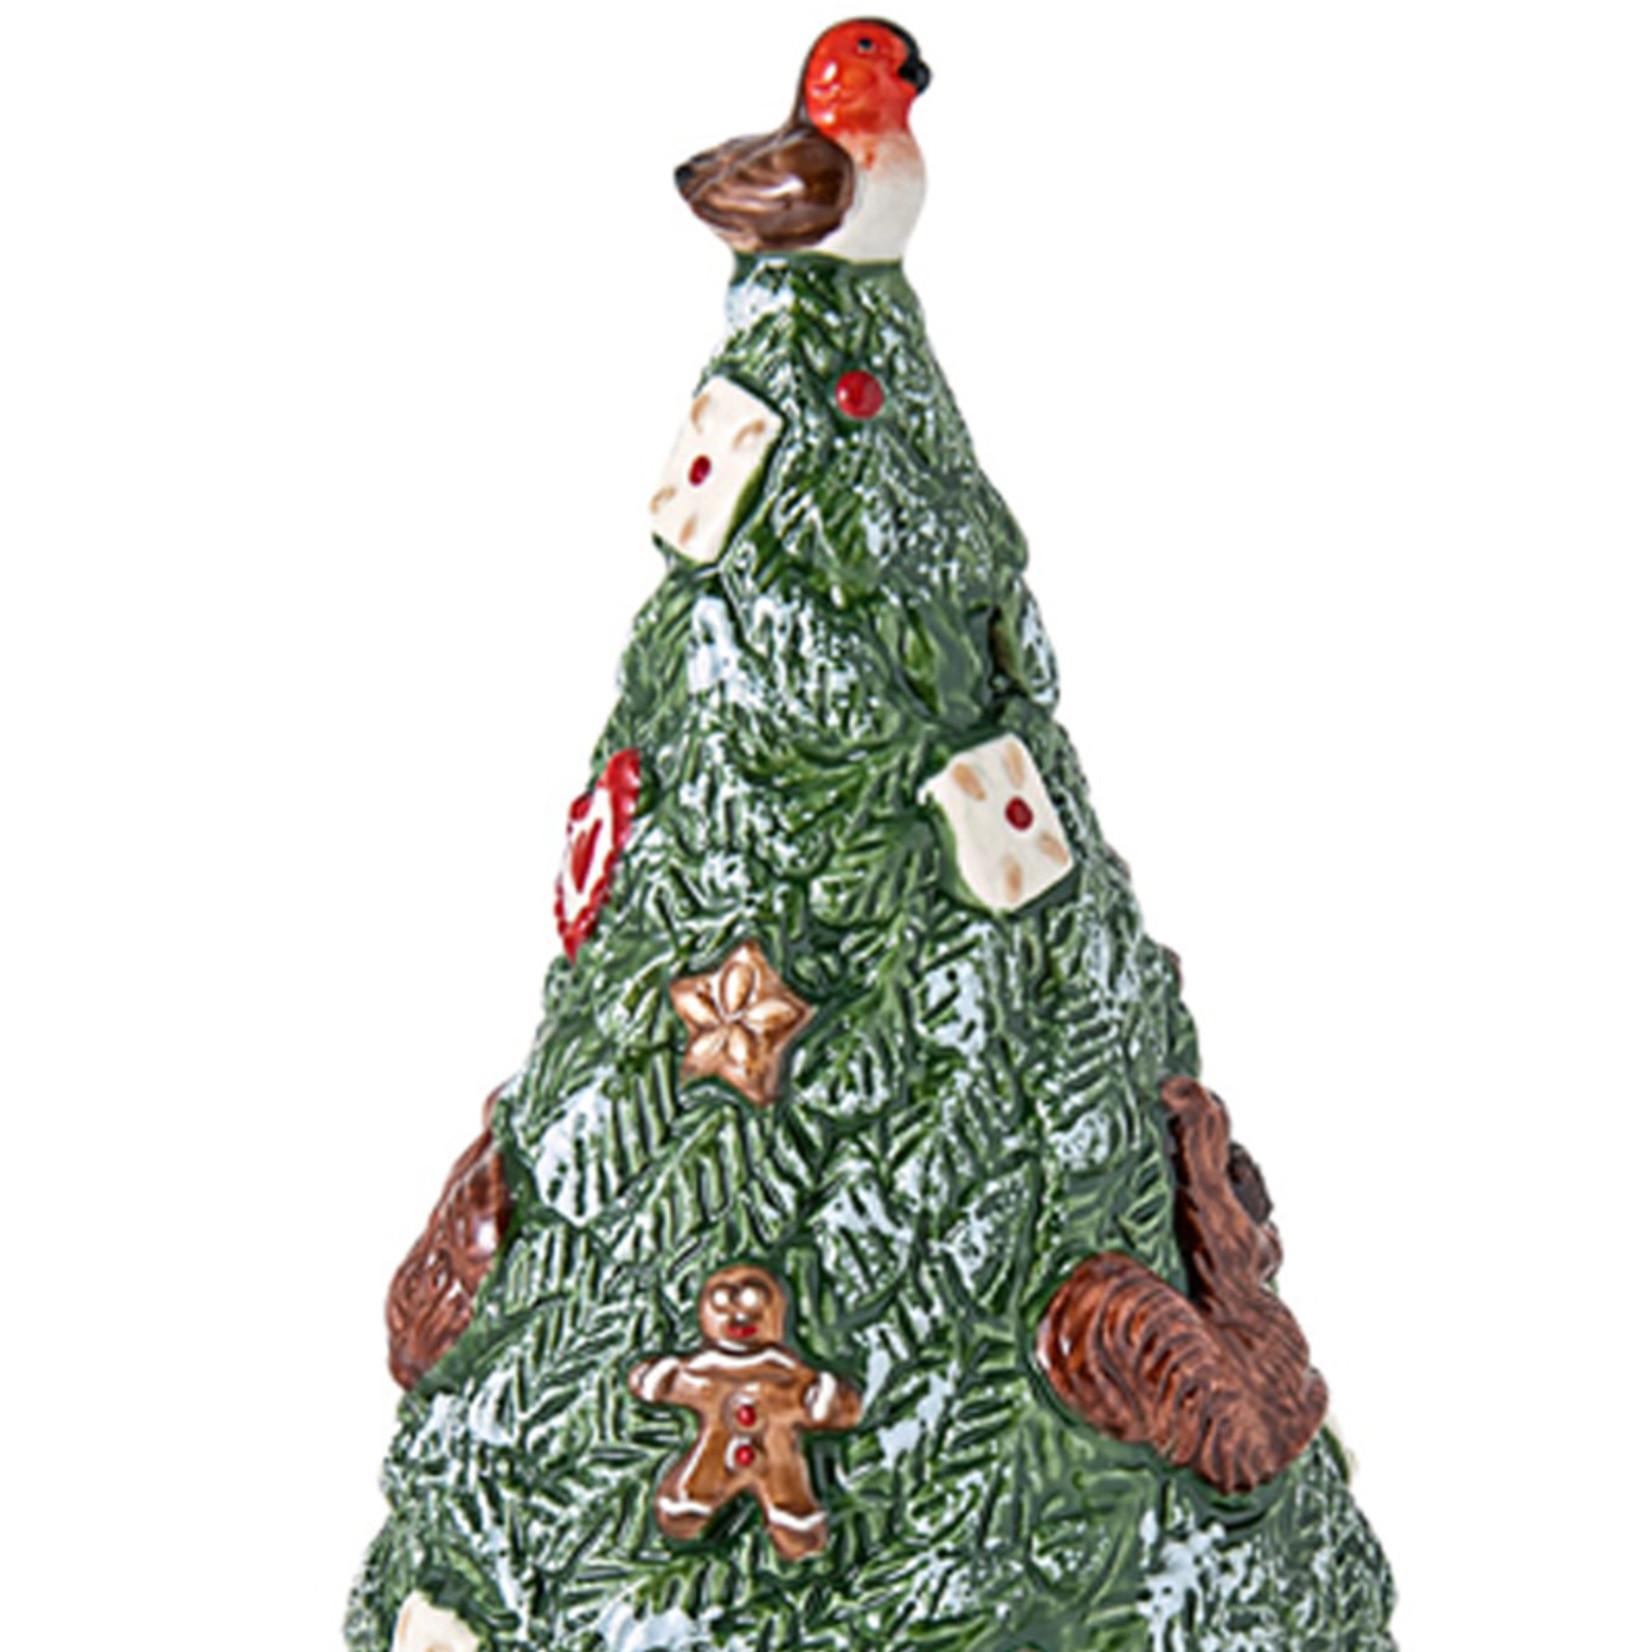 Villeroy & Boch  Spieluhr Weihnachtsbaum I Villeroy & Boch I Nostalgic Melody